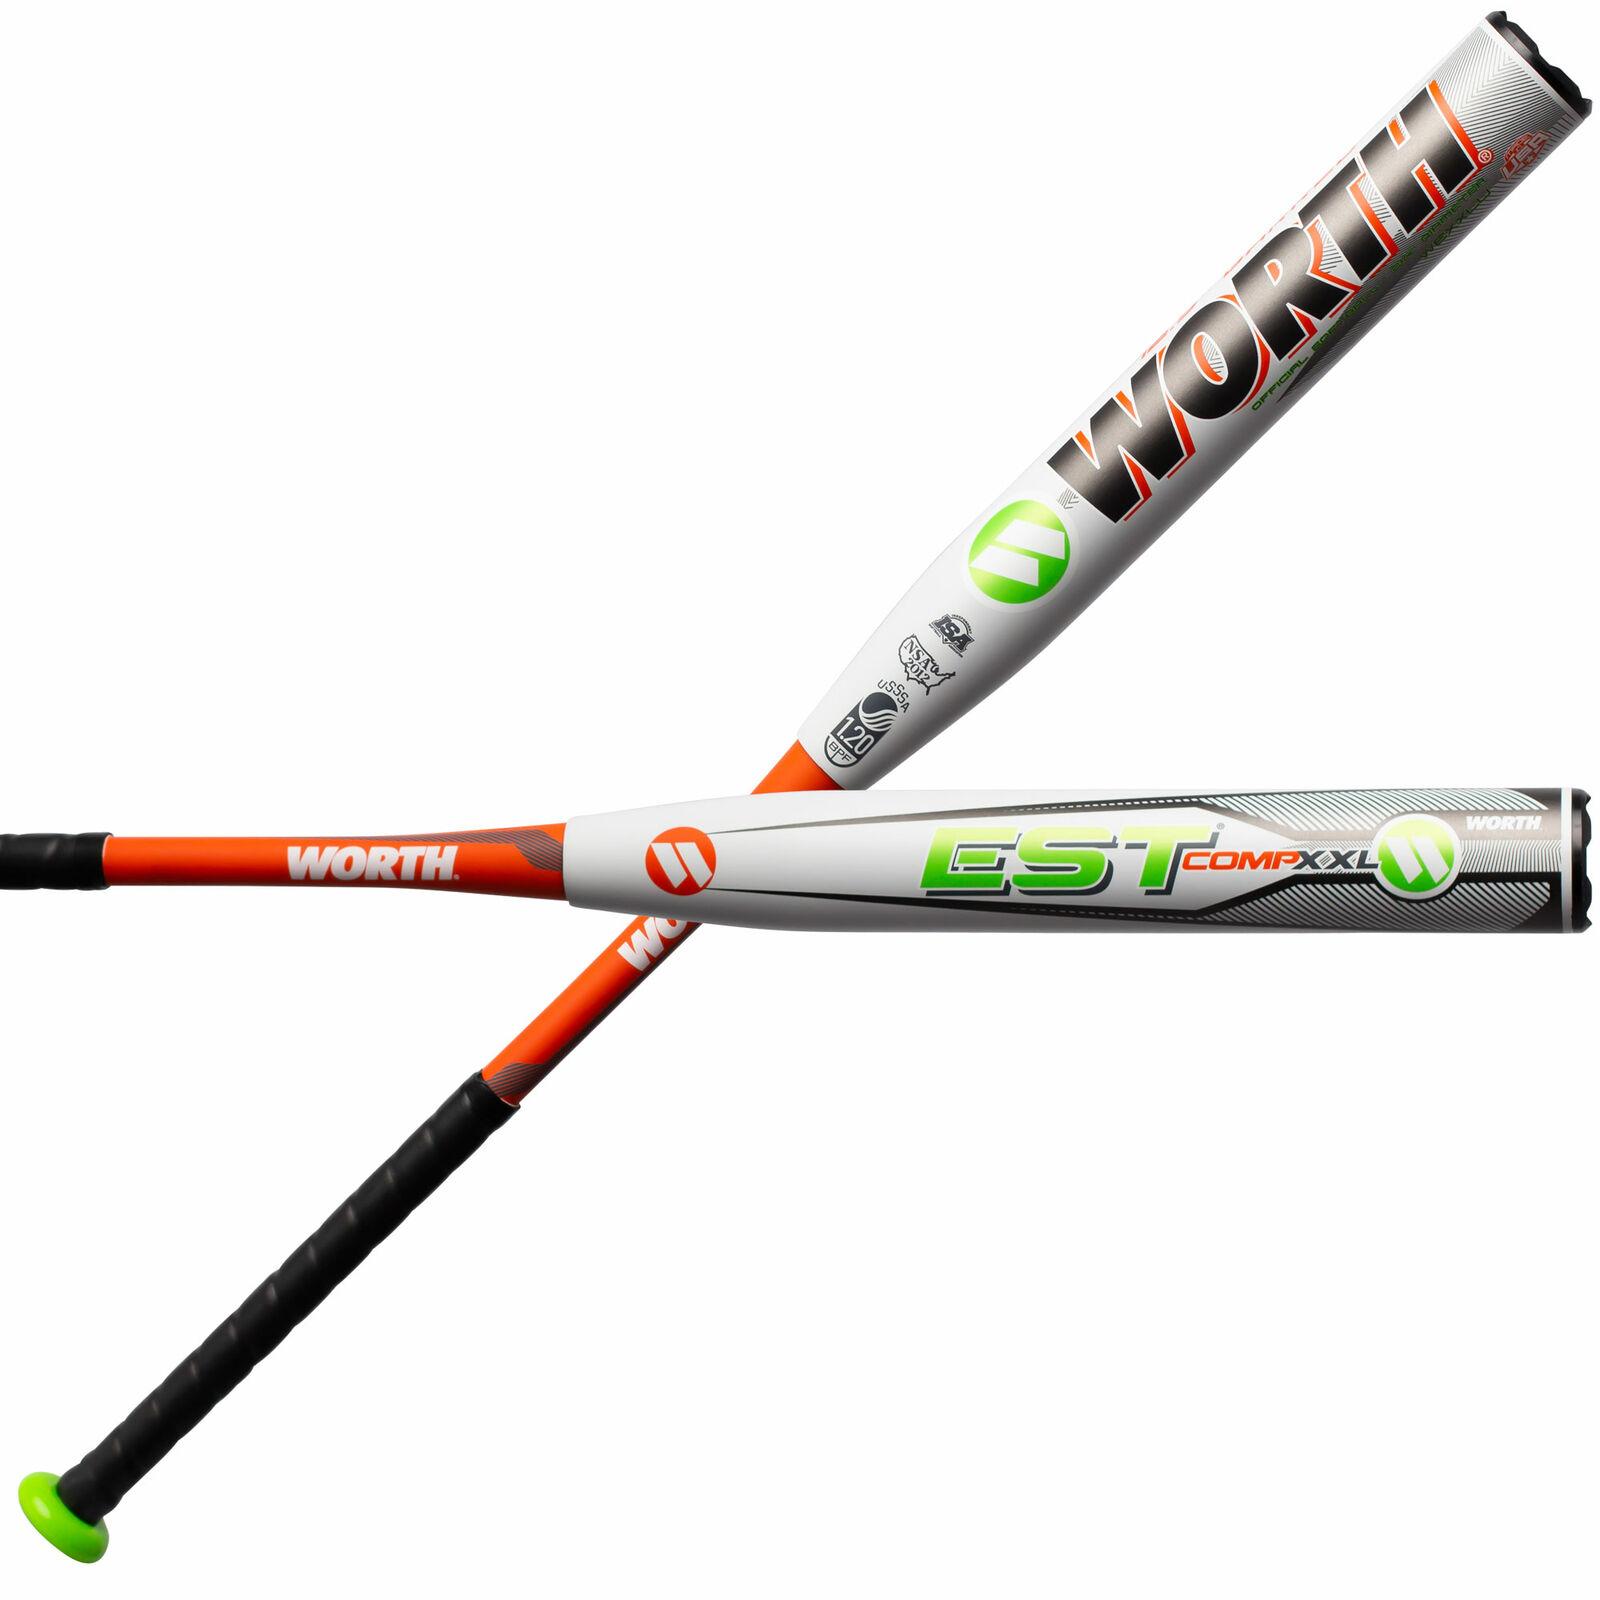 NEW 2019 Worth Est Comp XXL End Loaded WEXXLU USSSA Slowpitch Softball Bat